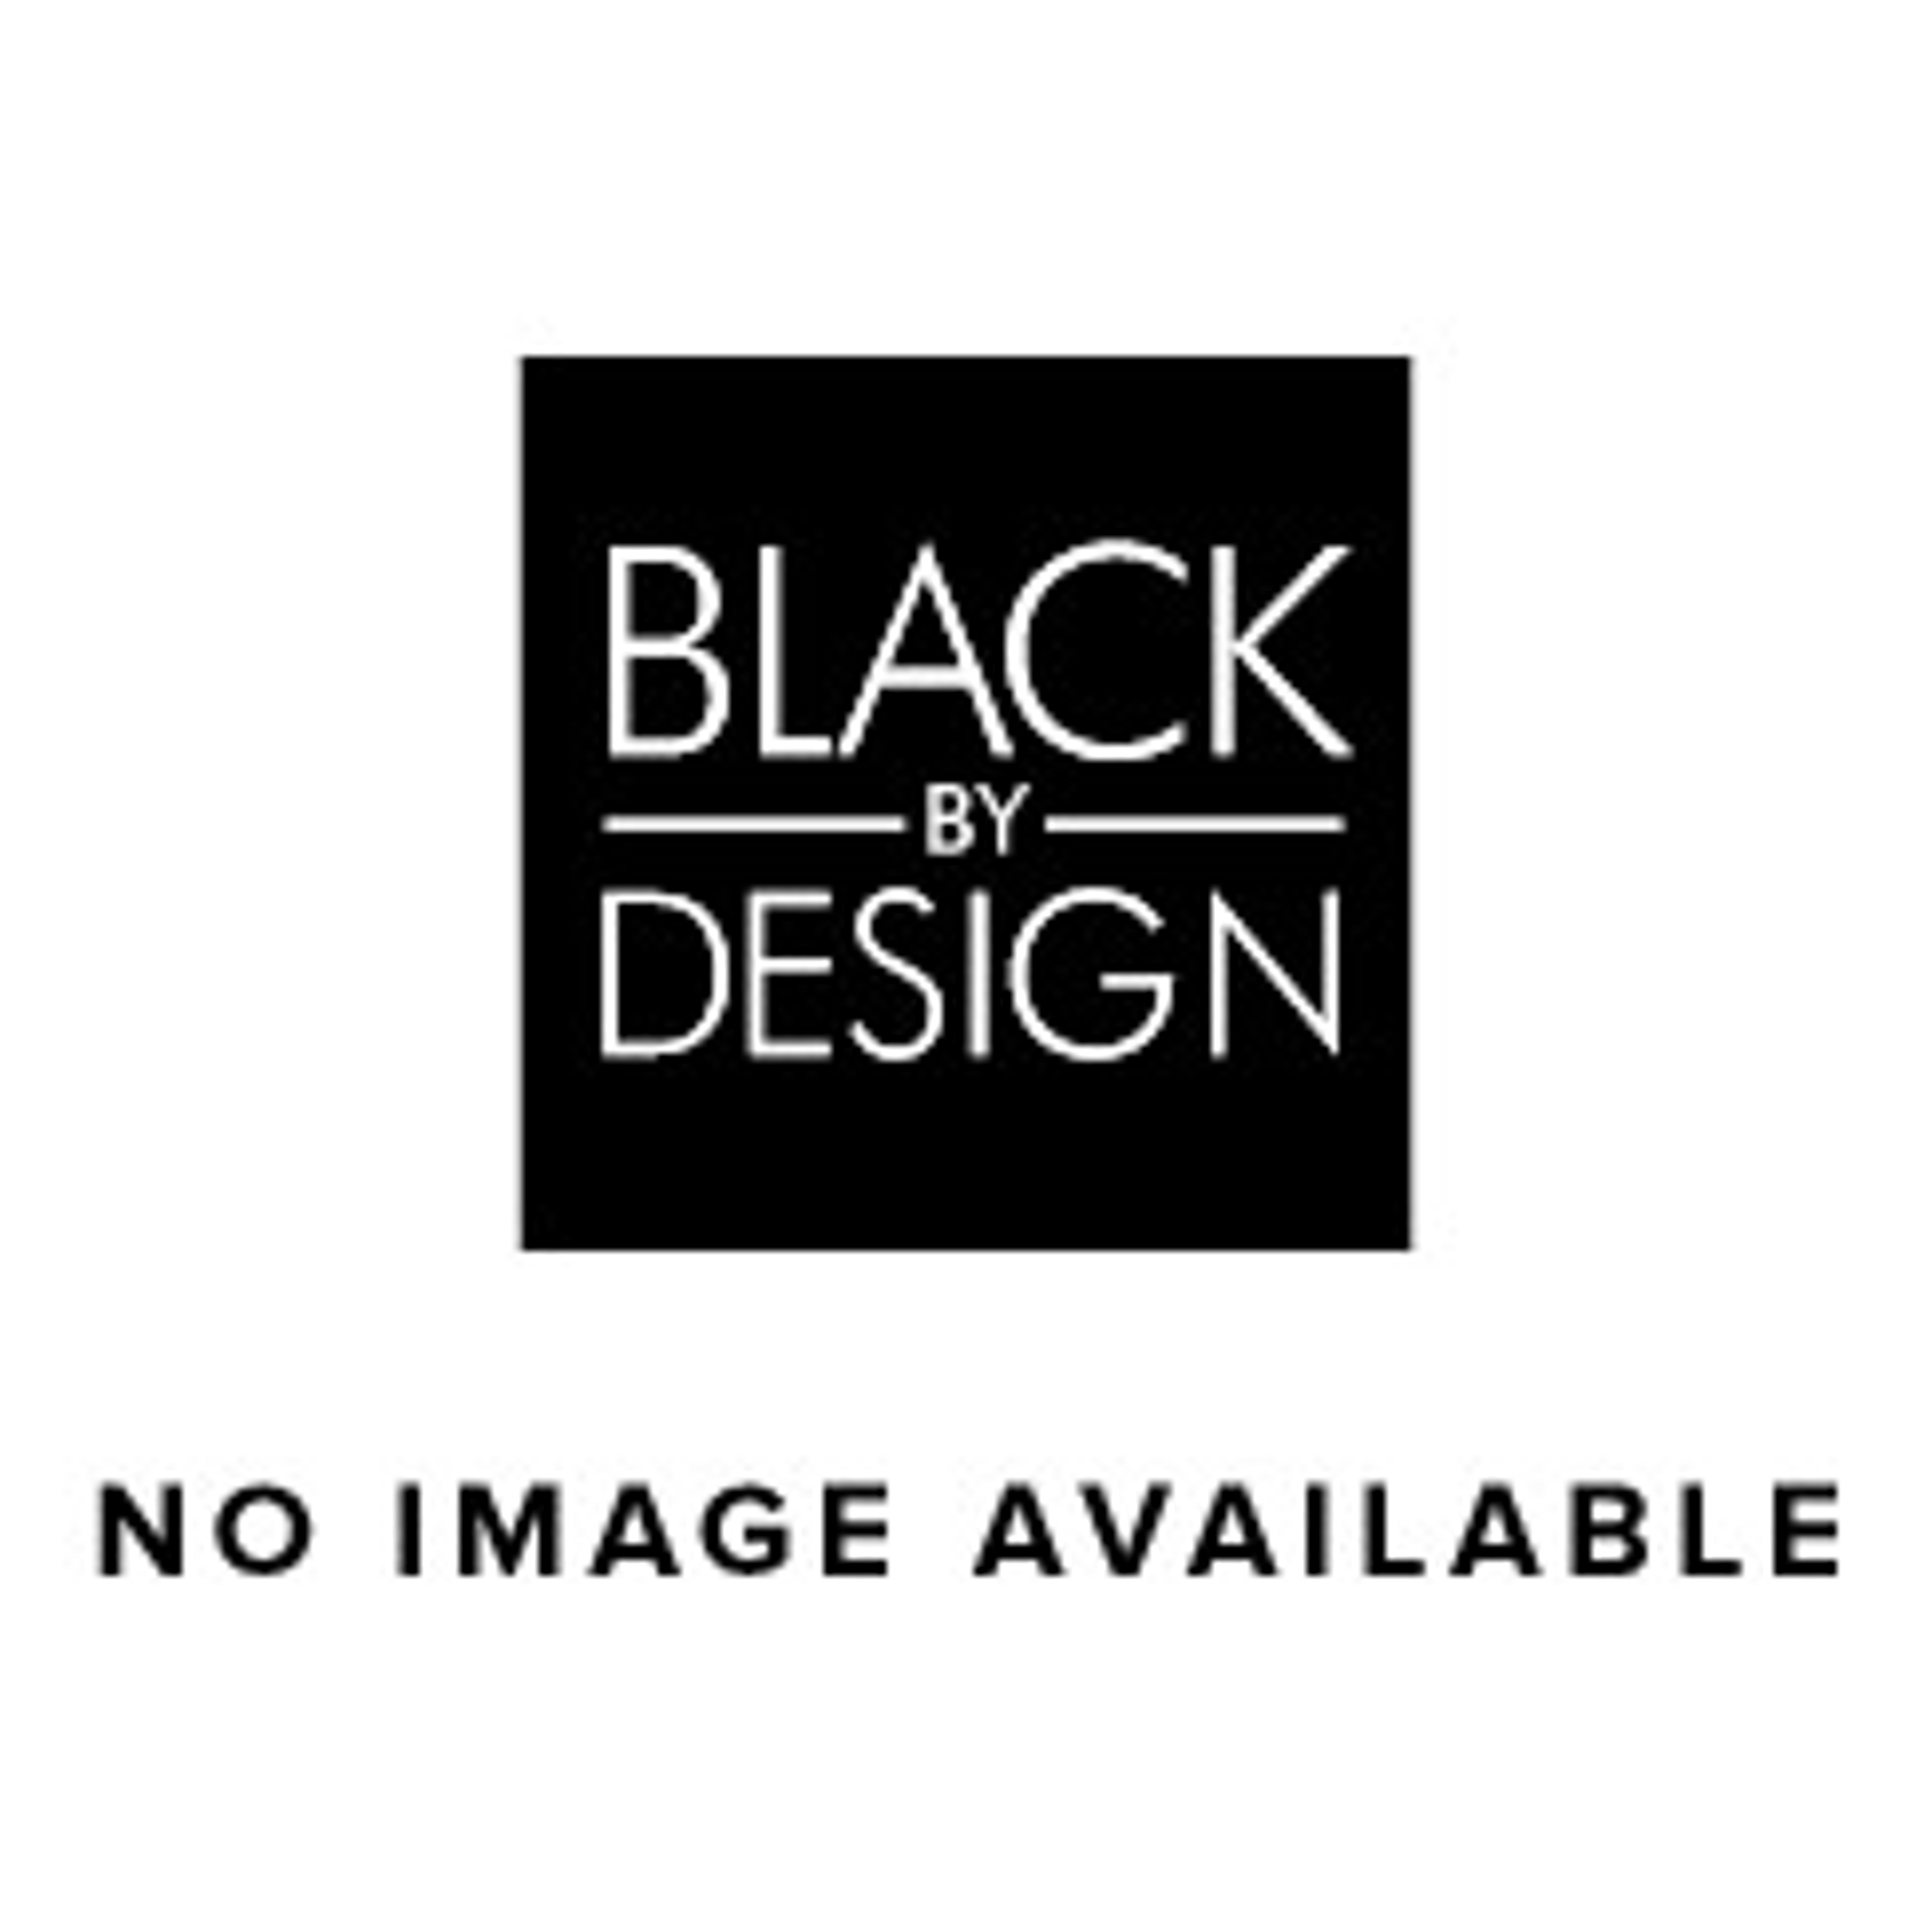 Vita cuna lamp shade white black by design cuna pendant shade white aloadofball Choice Image